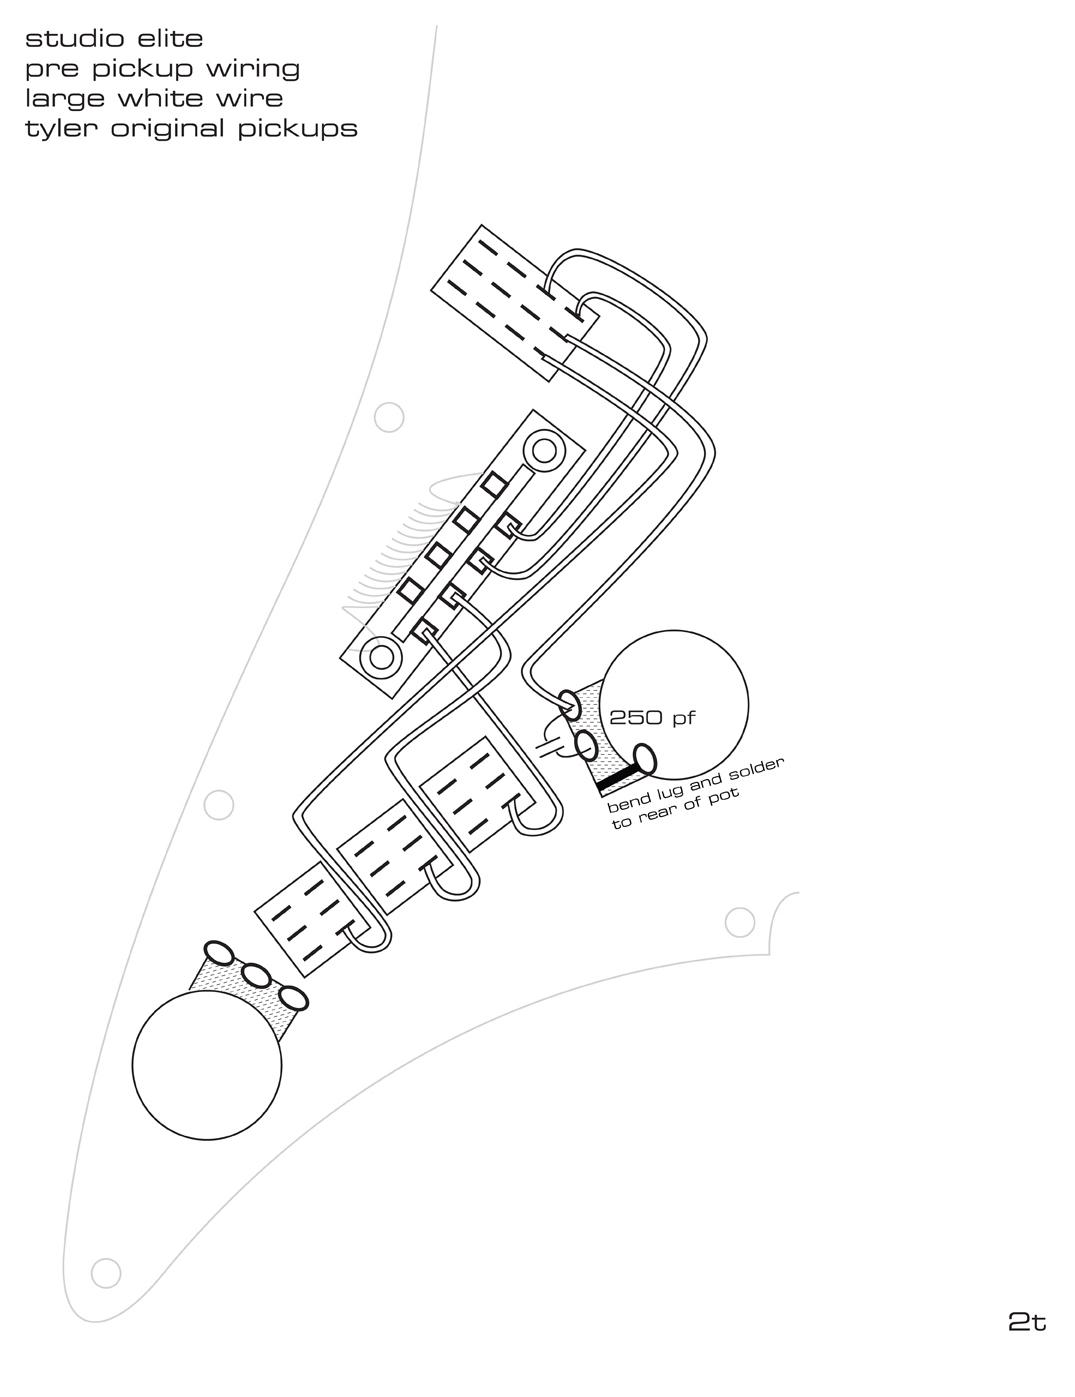 SE JTO System Wiring Manual Page 2.jpg